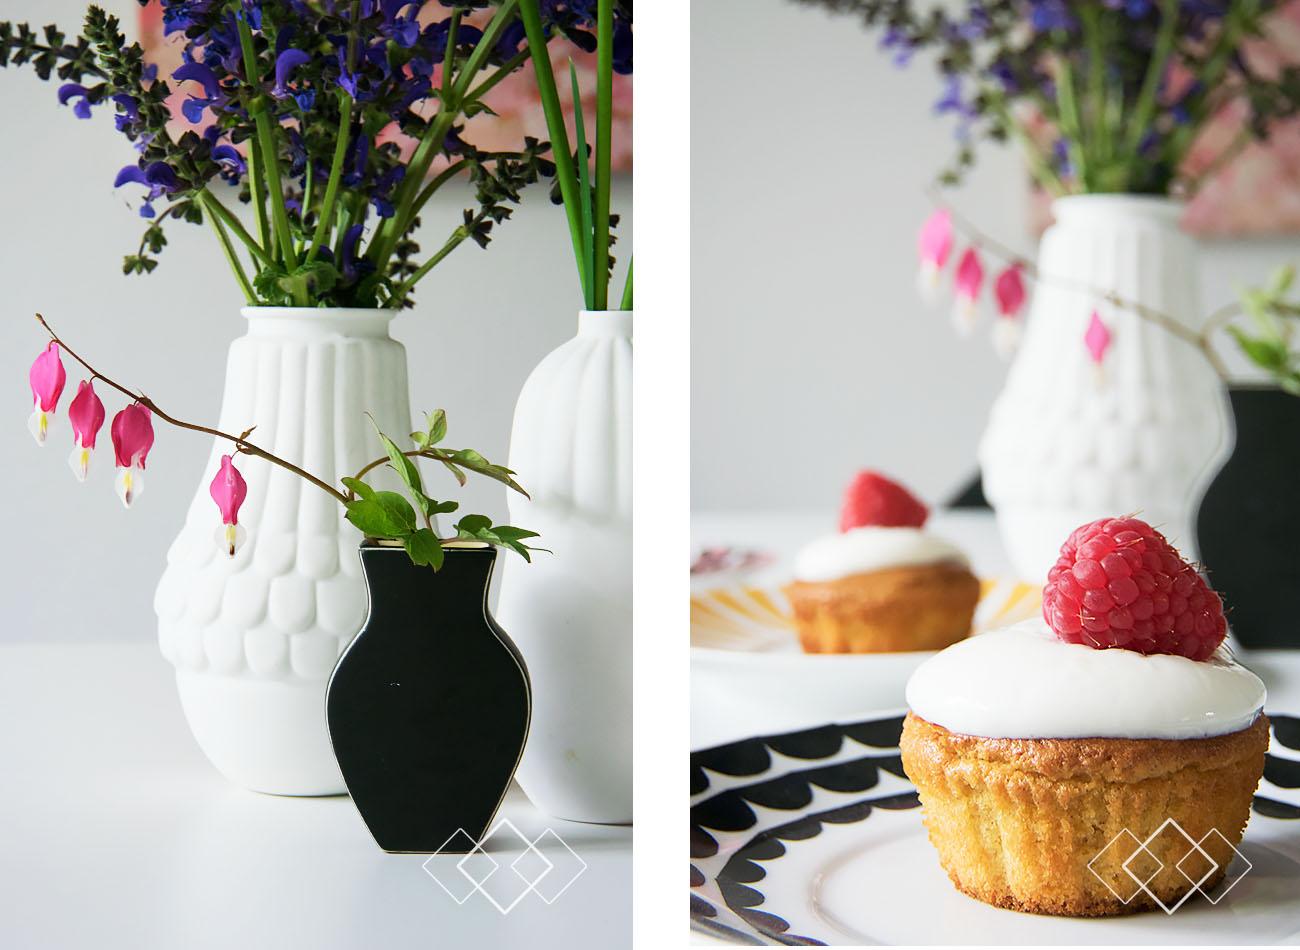 gezonde muffins - staand